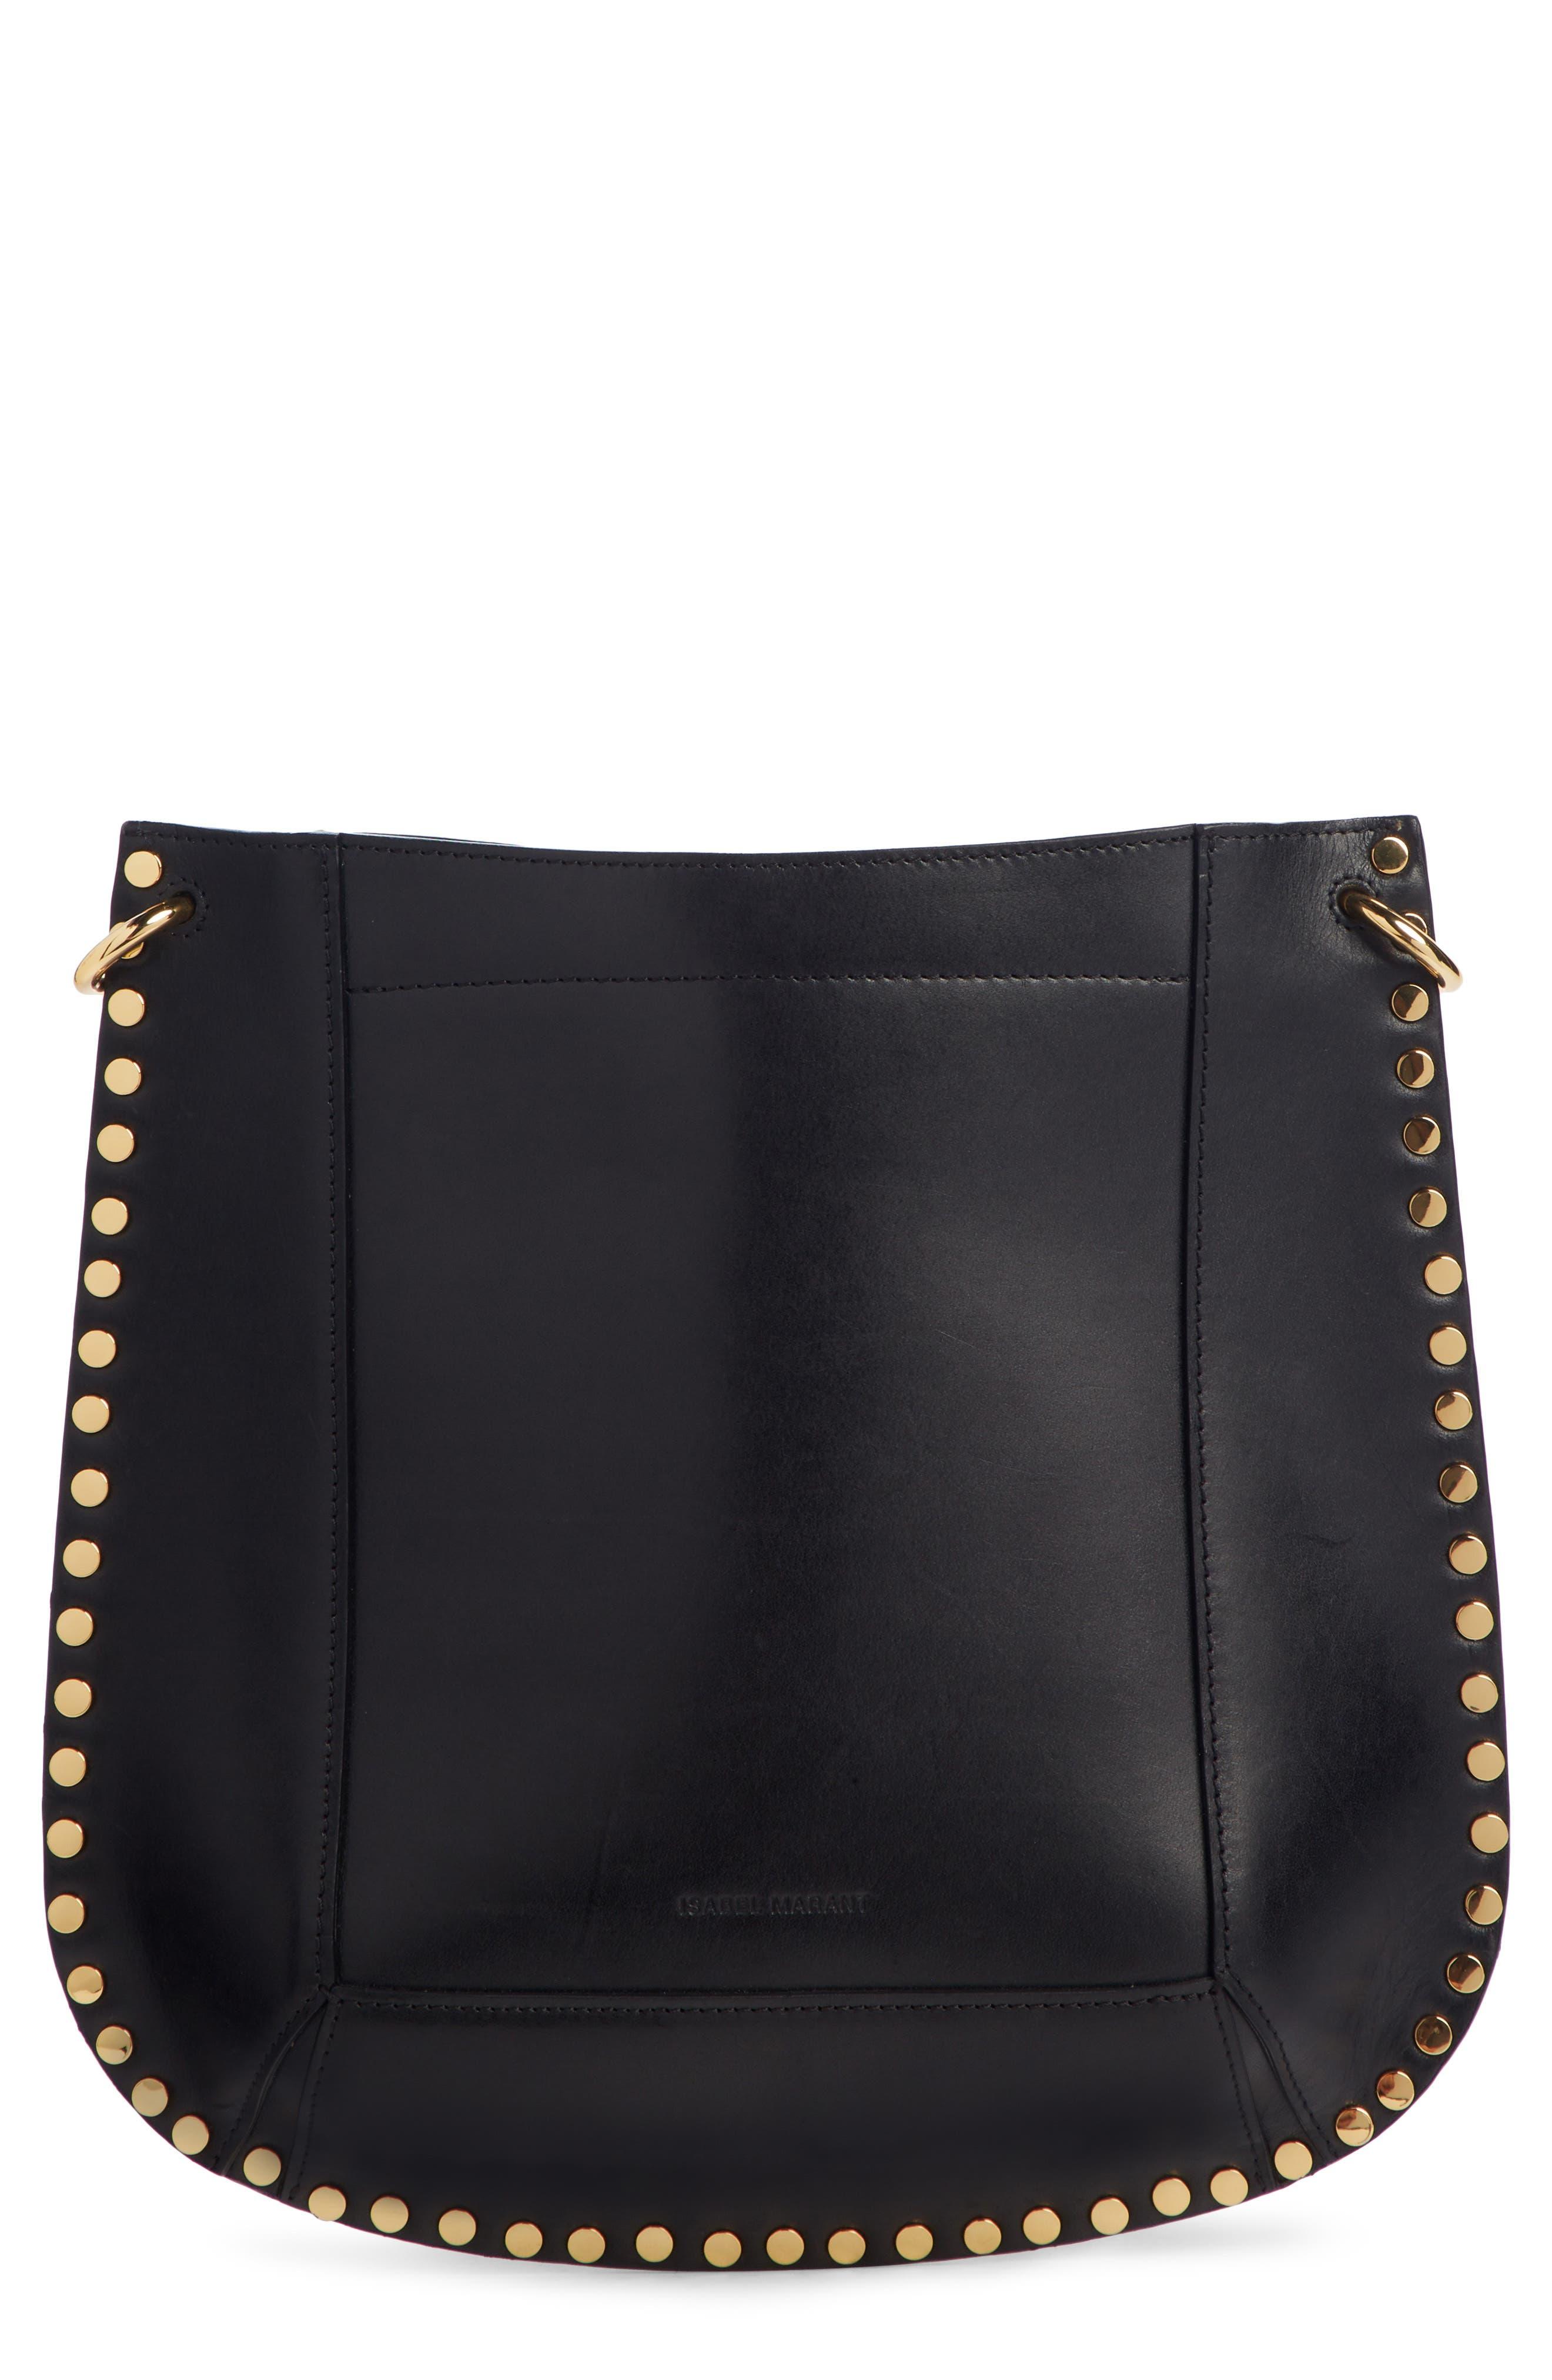 ISABEL MARANT Oskan New Leather Hobo, Main, color, BLACK